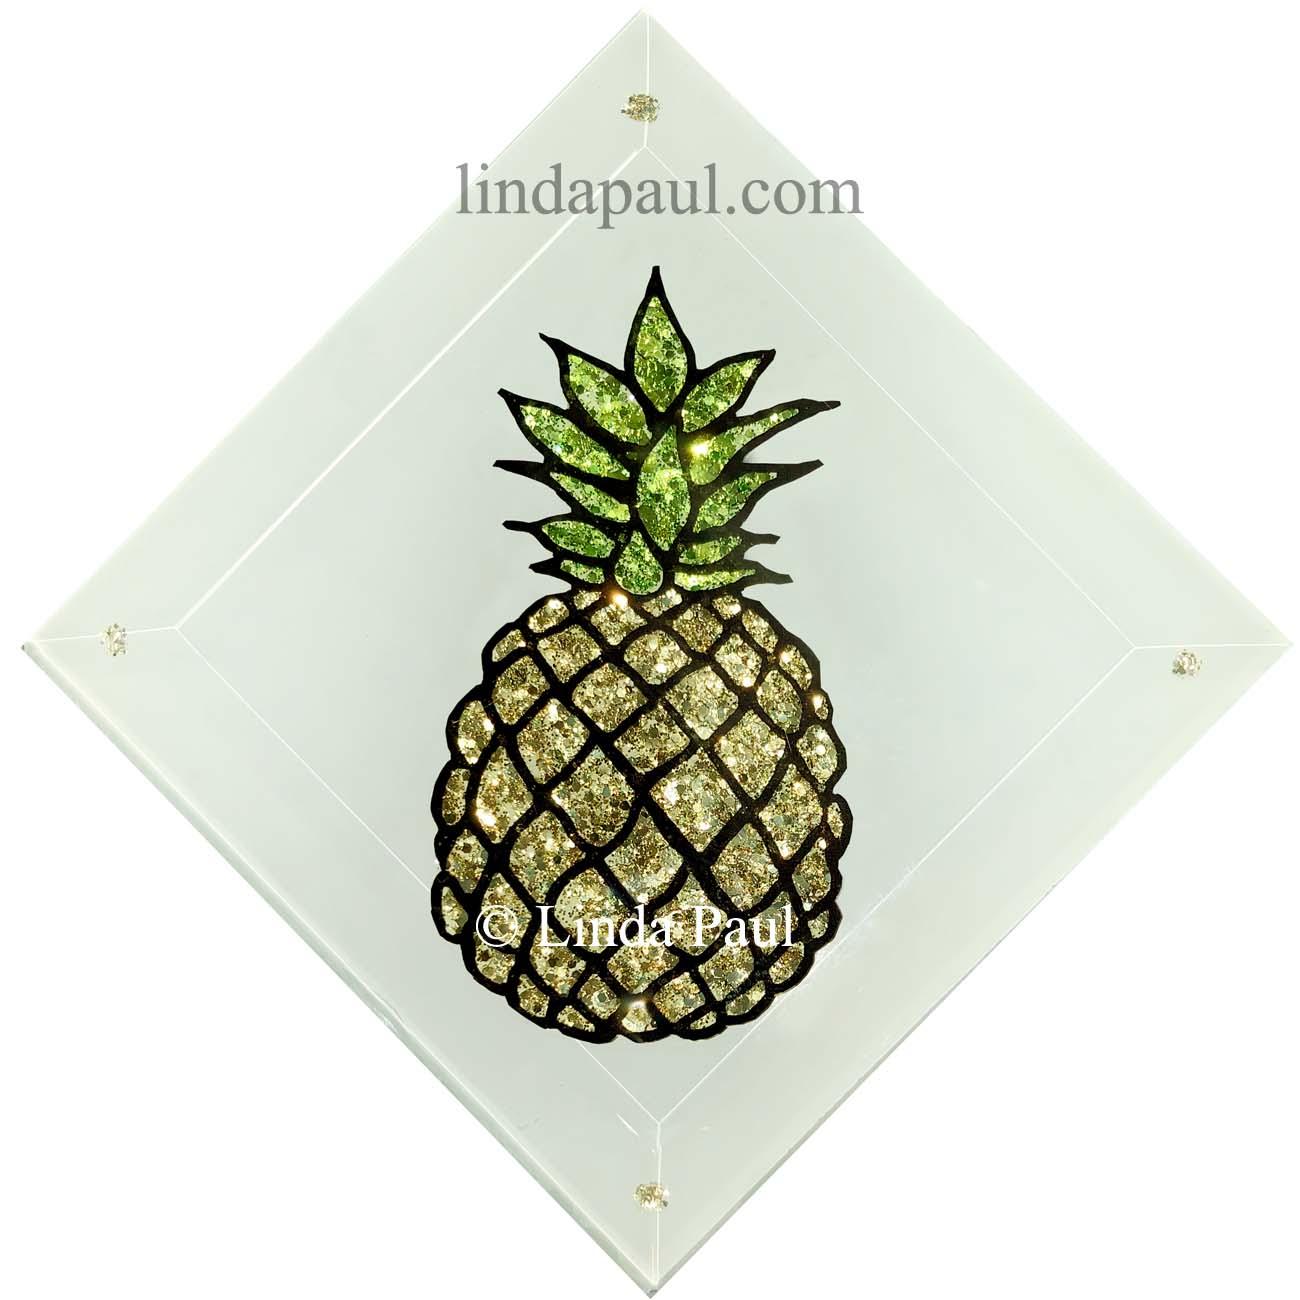 Pineapple And Palm Tree Handmade Glass Tilesartist Linda Paul (View 19 of 30)